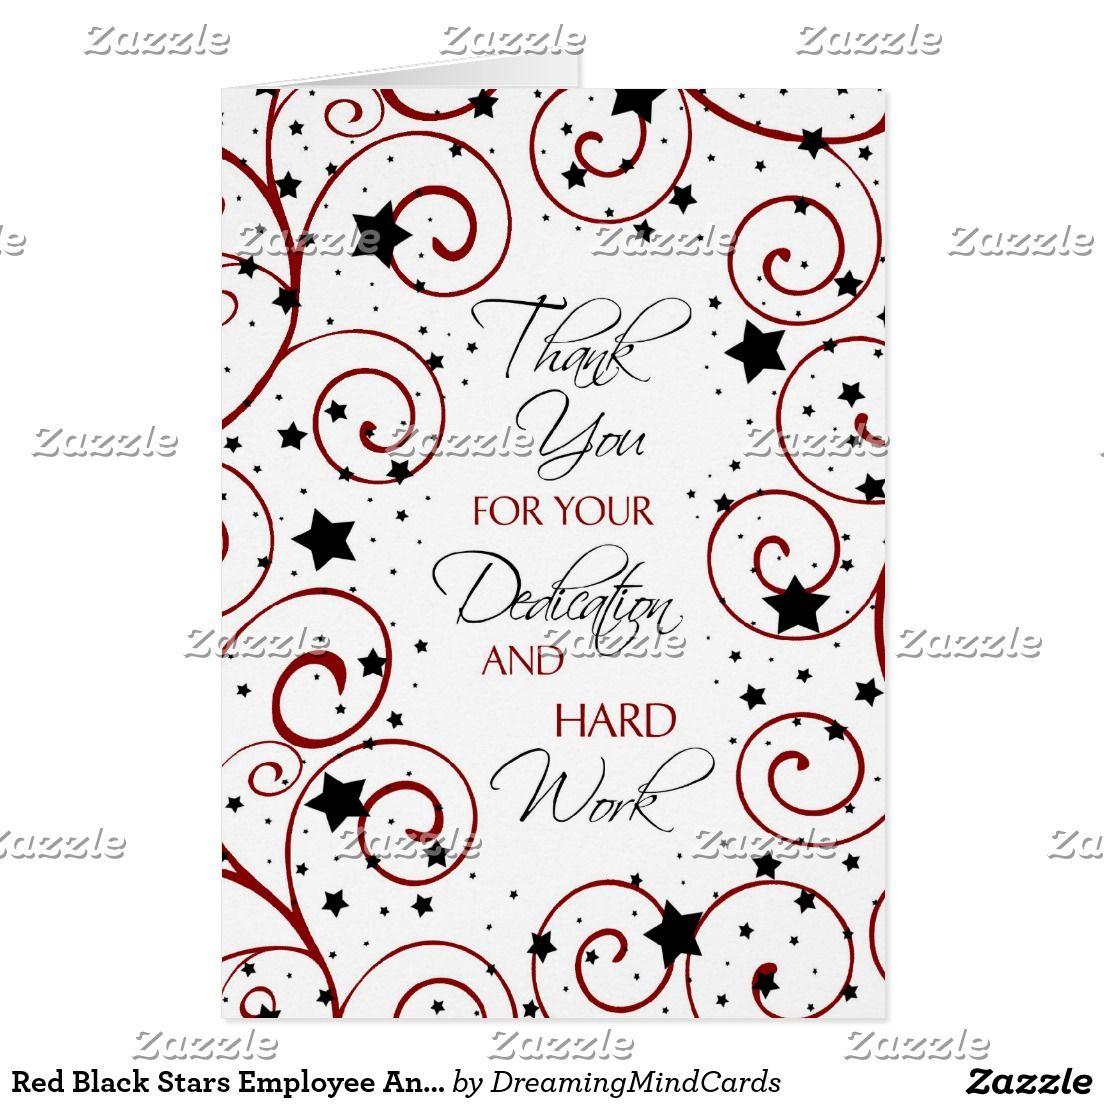 red black stars employee anniversary card - Employee Anniversary Cards